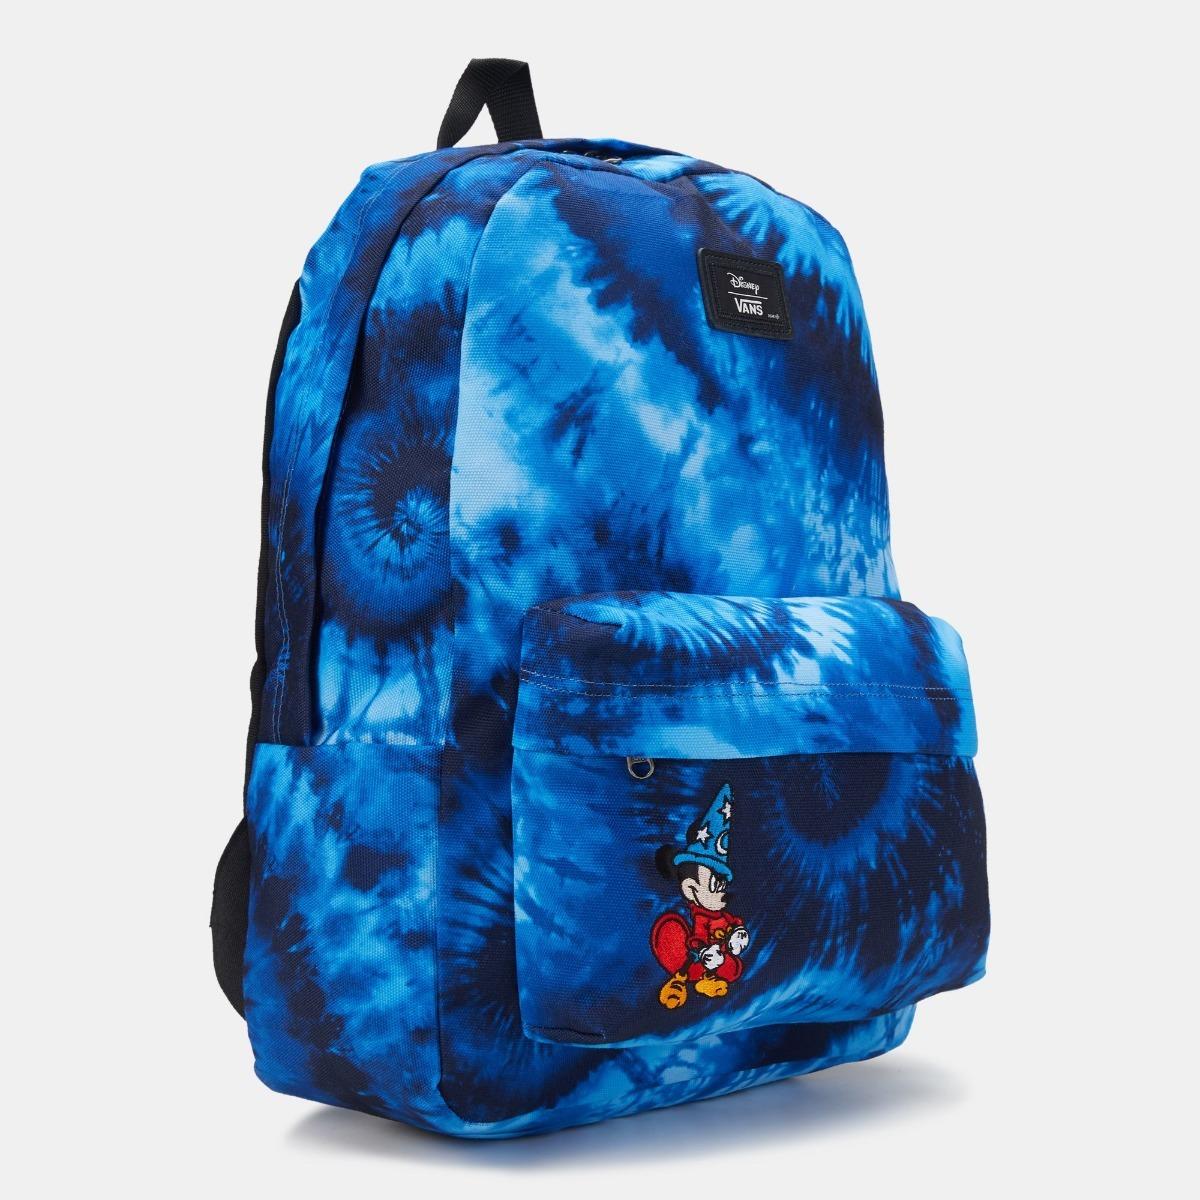 0be30de7bec83 mochila vans old skool mickey disney classic azul tie dye. Cargando zoom.